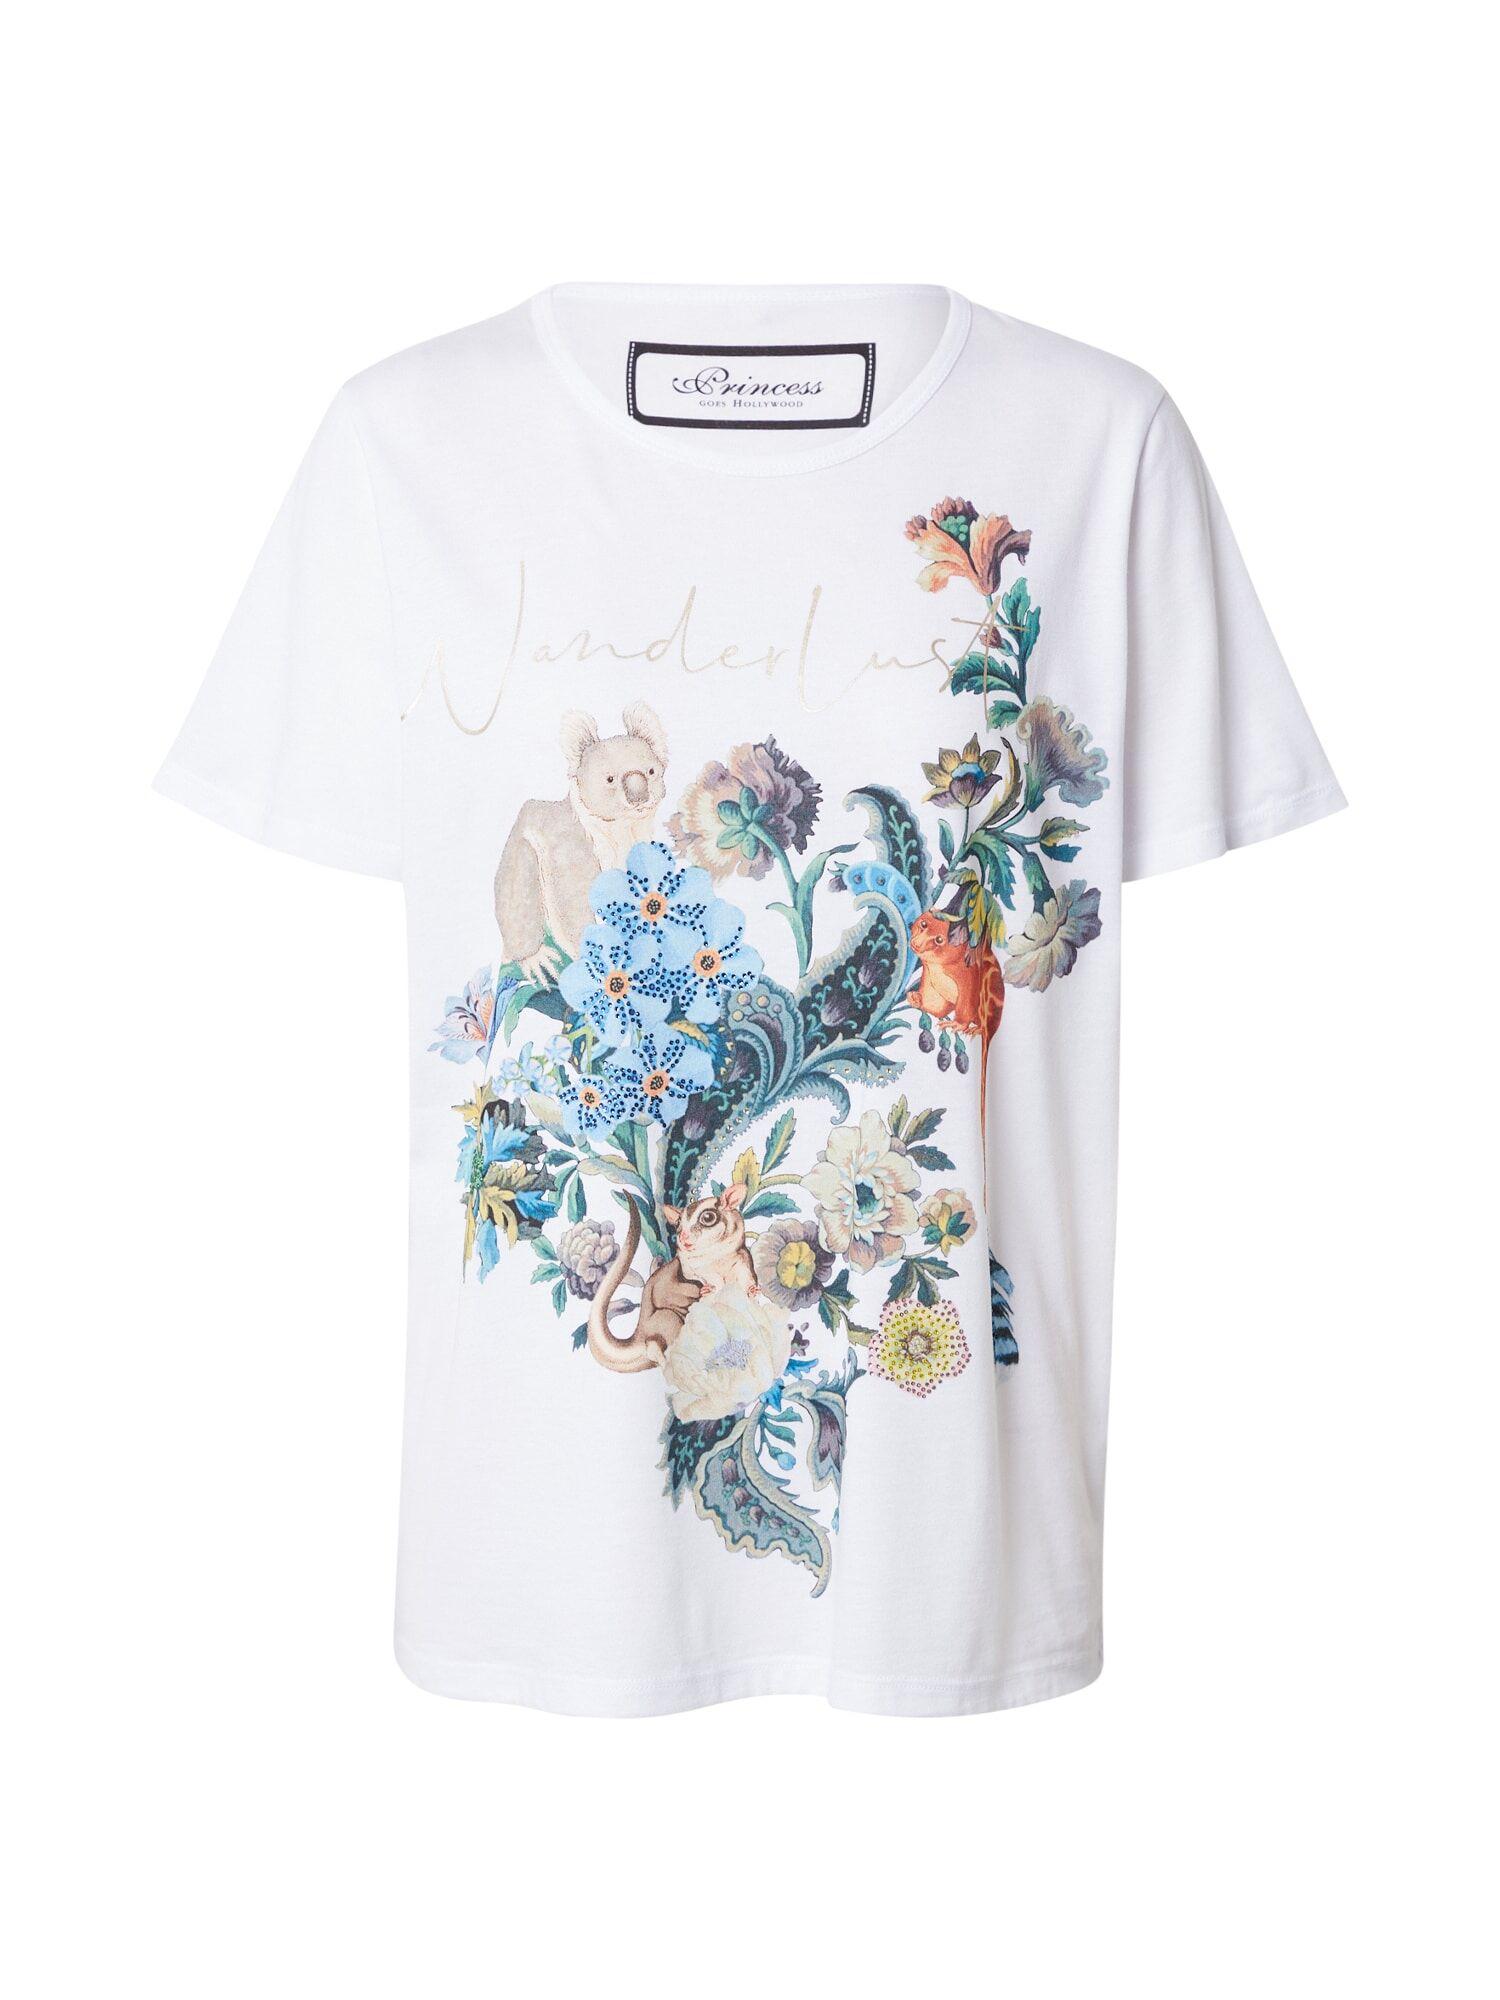 Princess T-shirt 'Wanderlust'  - Blanc - Taille: 40 - female